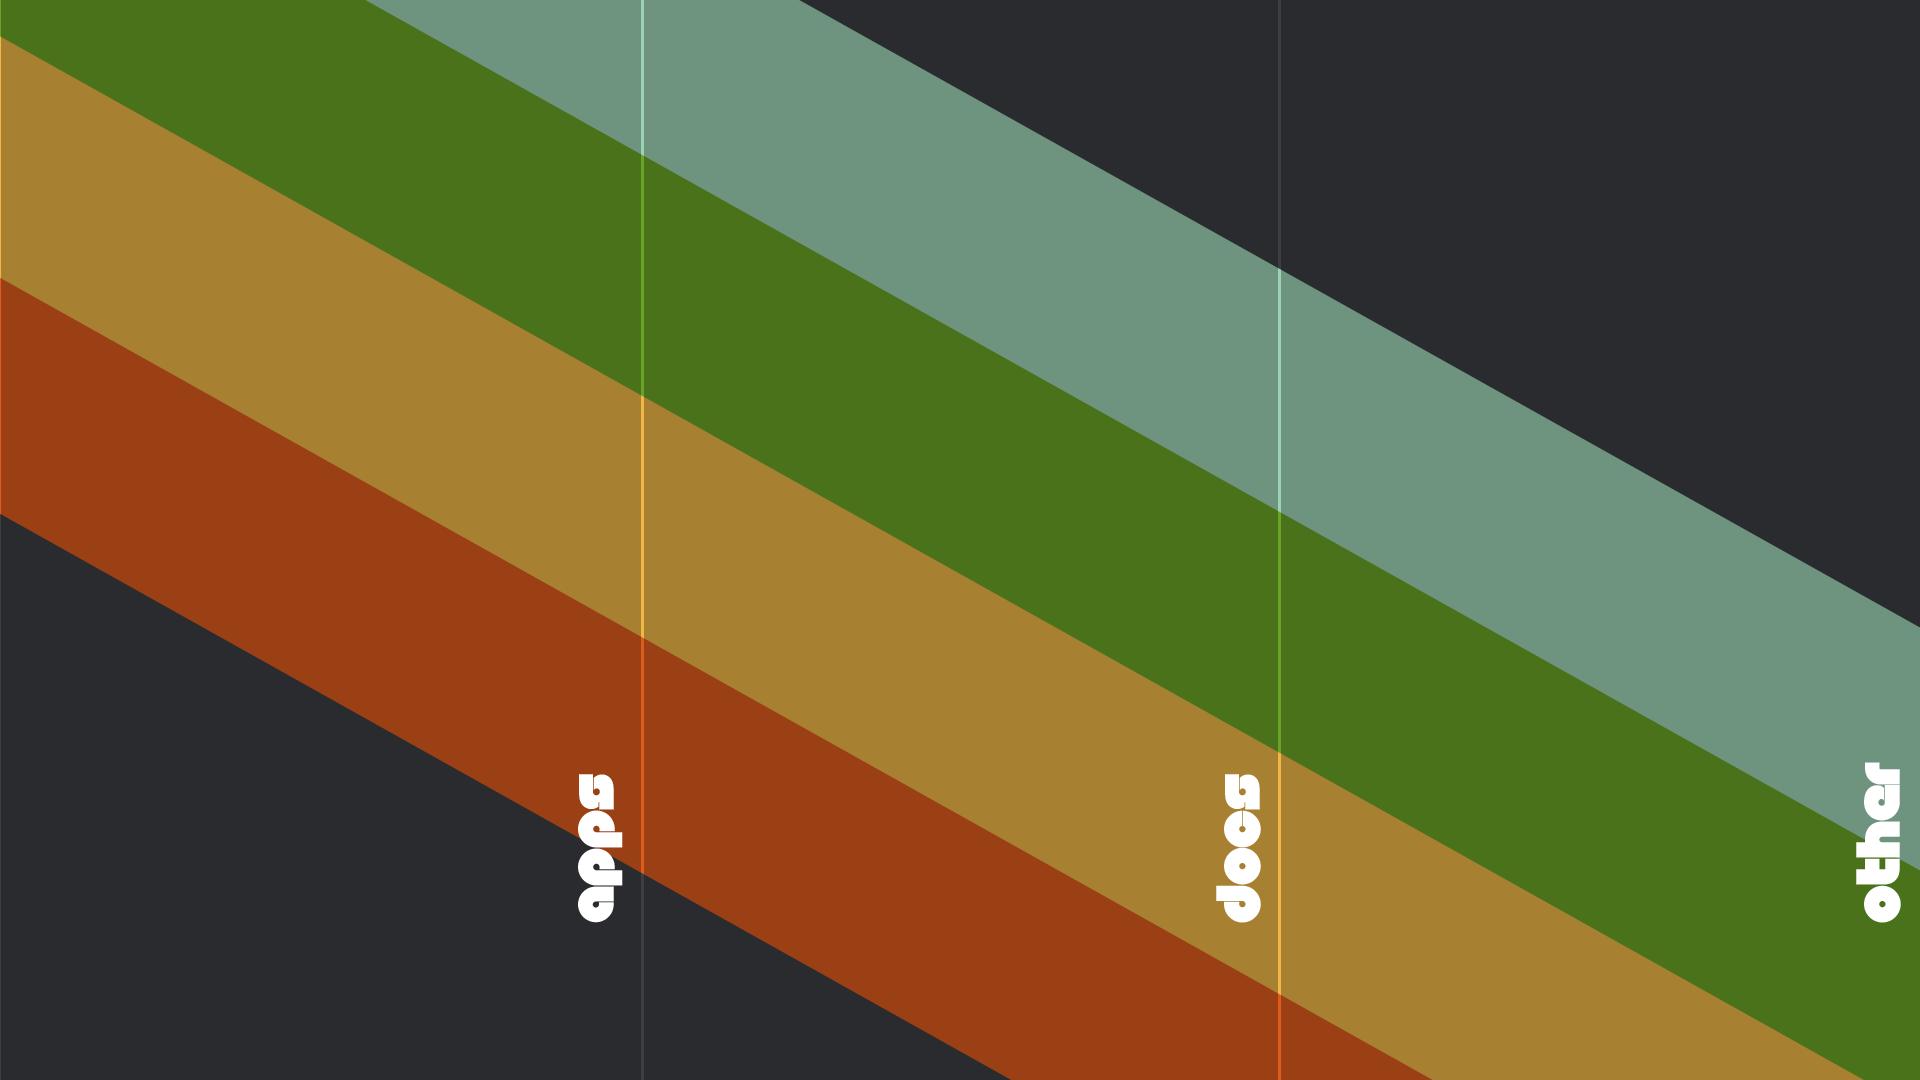 Productivitywallpaperlifehacker 1920x1080